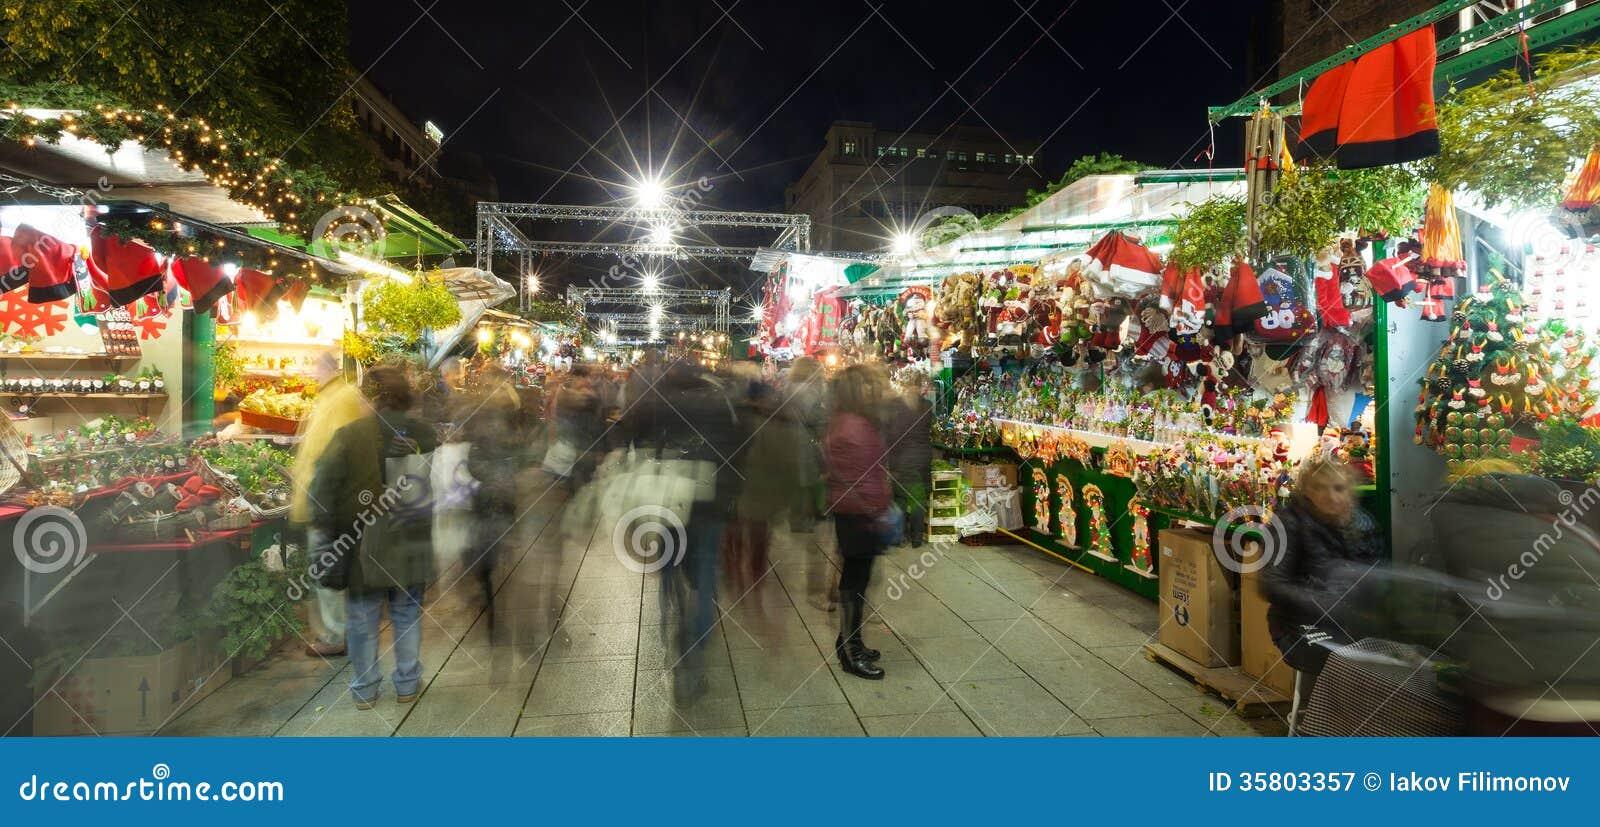 Fira de Santa Llucia - Christmas market in Barcelona